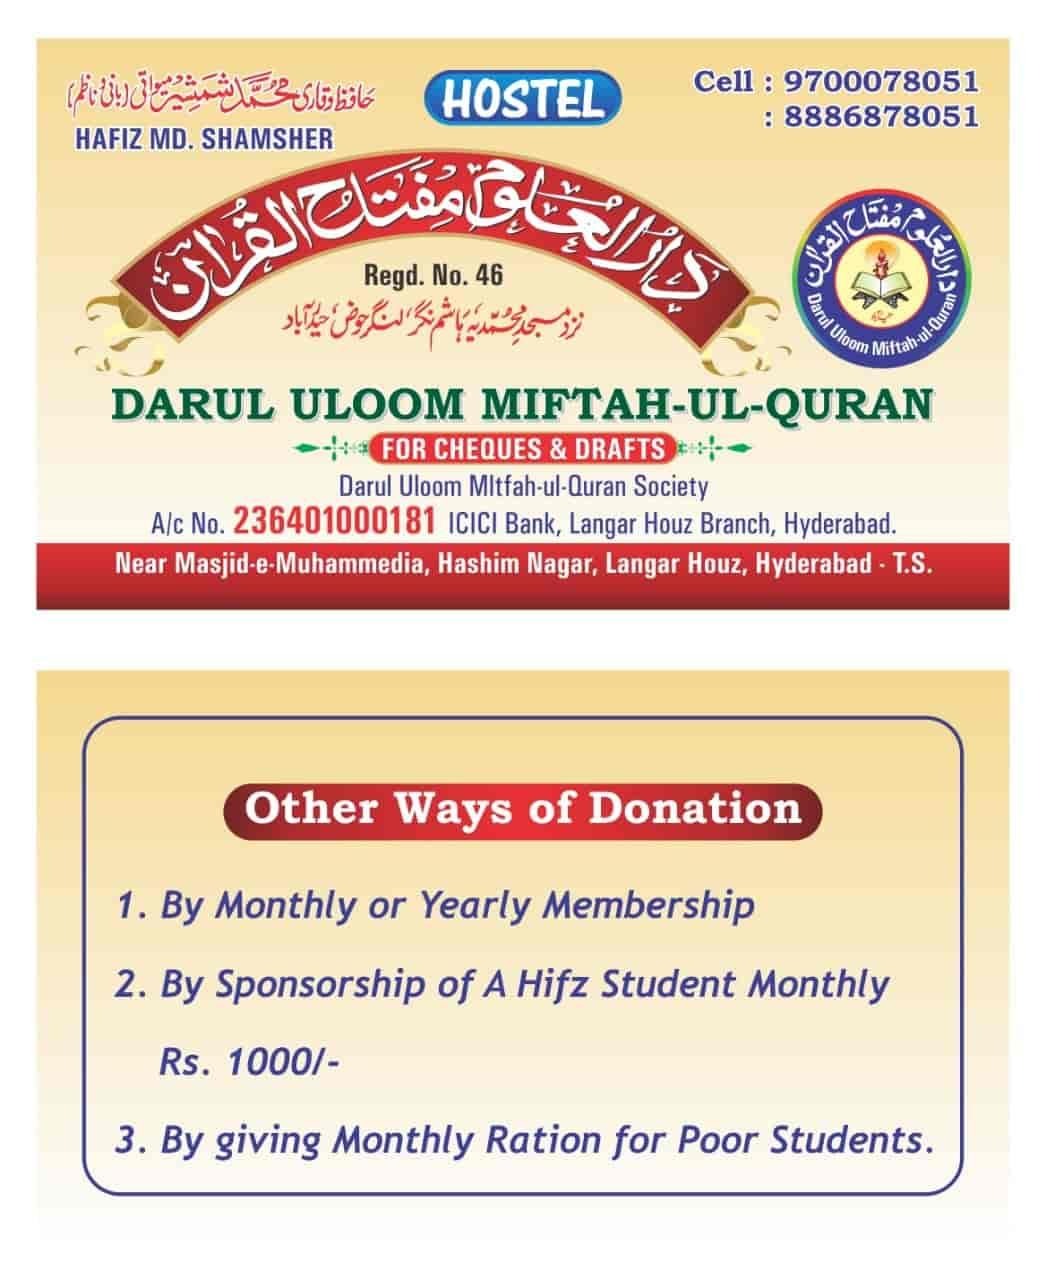 Darul Uloom Miftah Ul Quran Society Photos, Lunger House